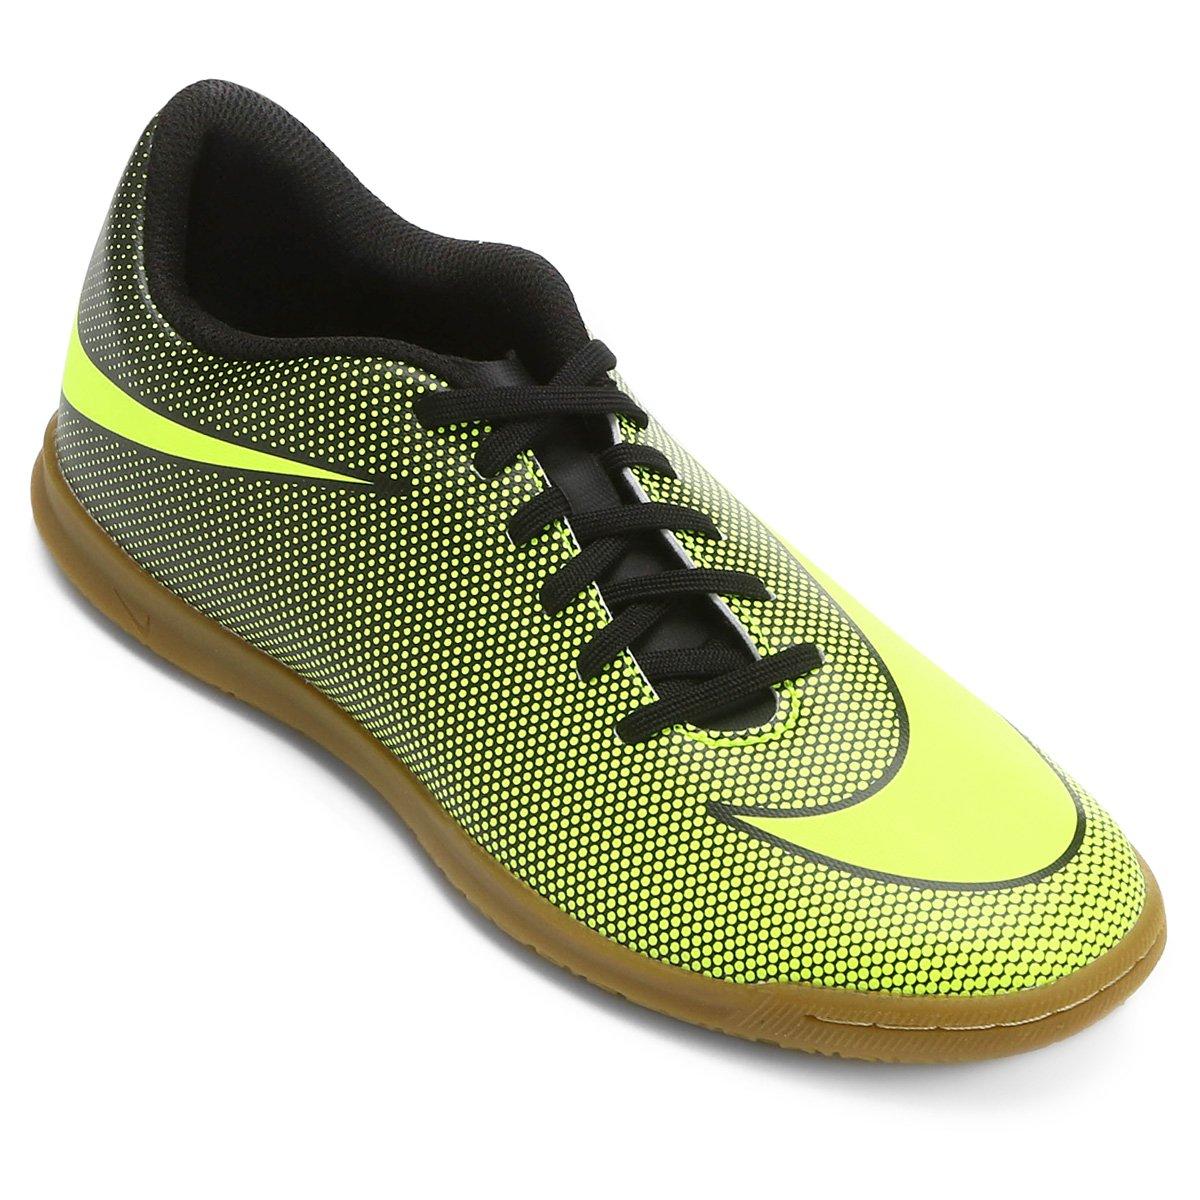 104522eb05 Chuteira Futsal Nike Bravata 2 IC - Preto e Amarelo - Compre Agora ...